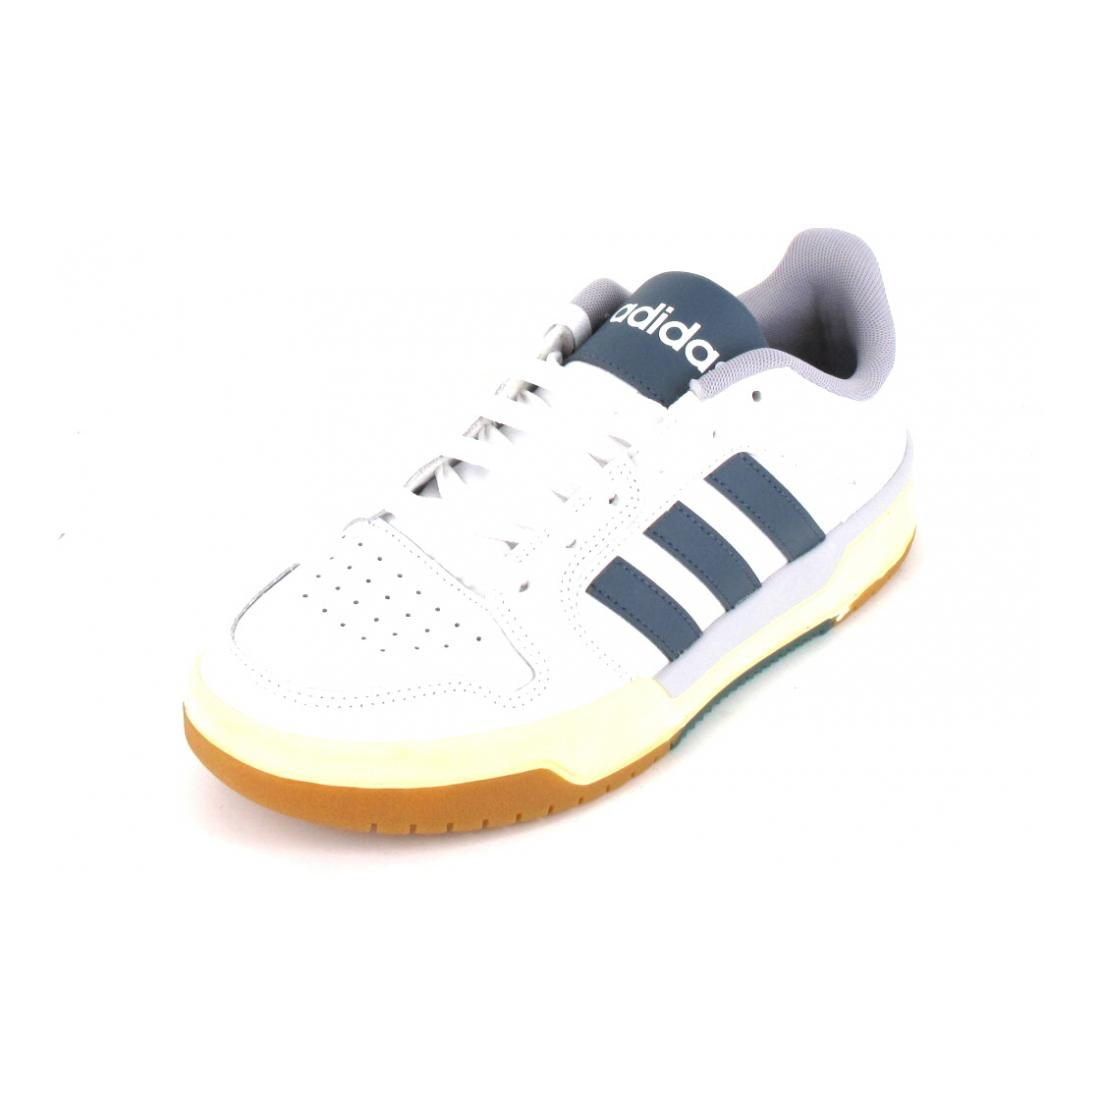 adidas Sneaker FW3463-000 Entrap